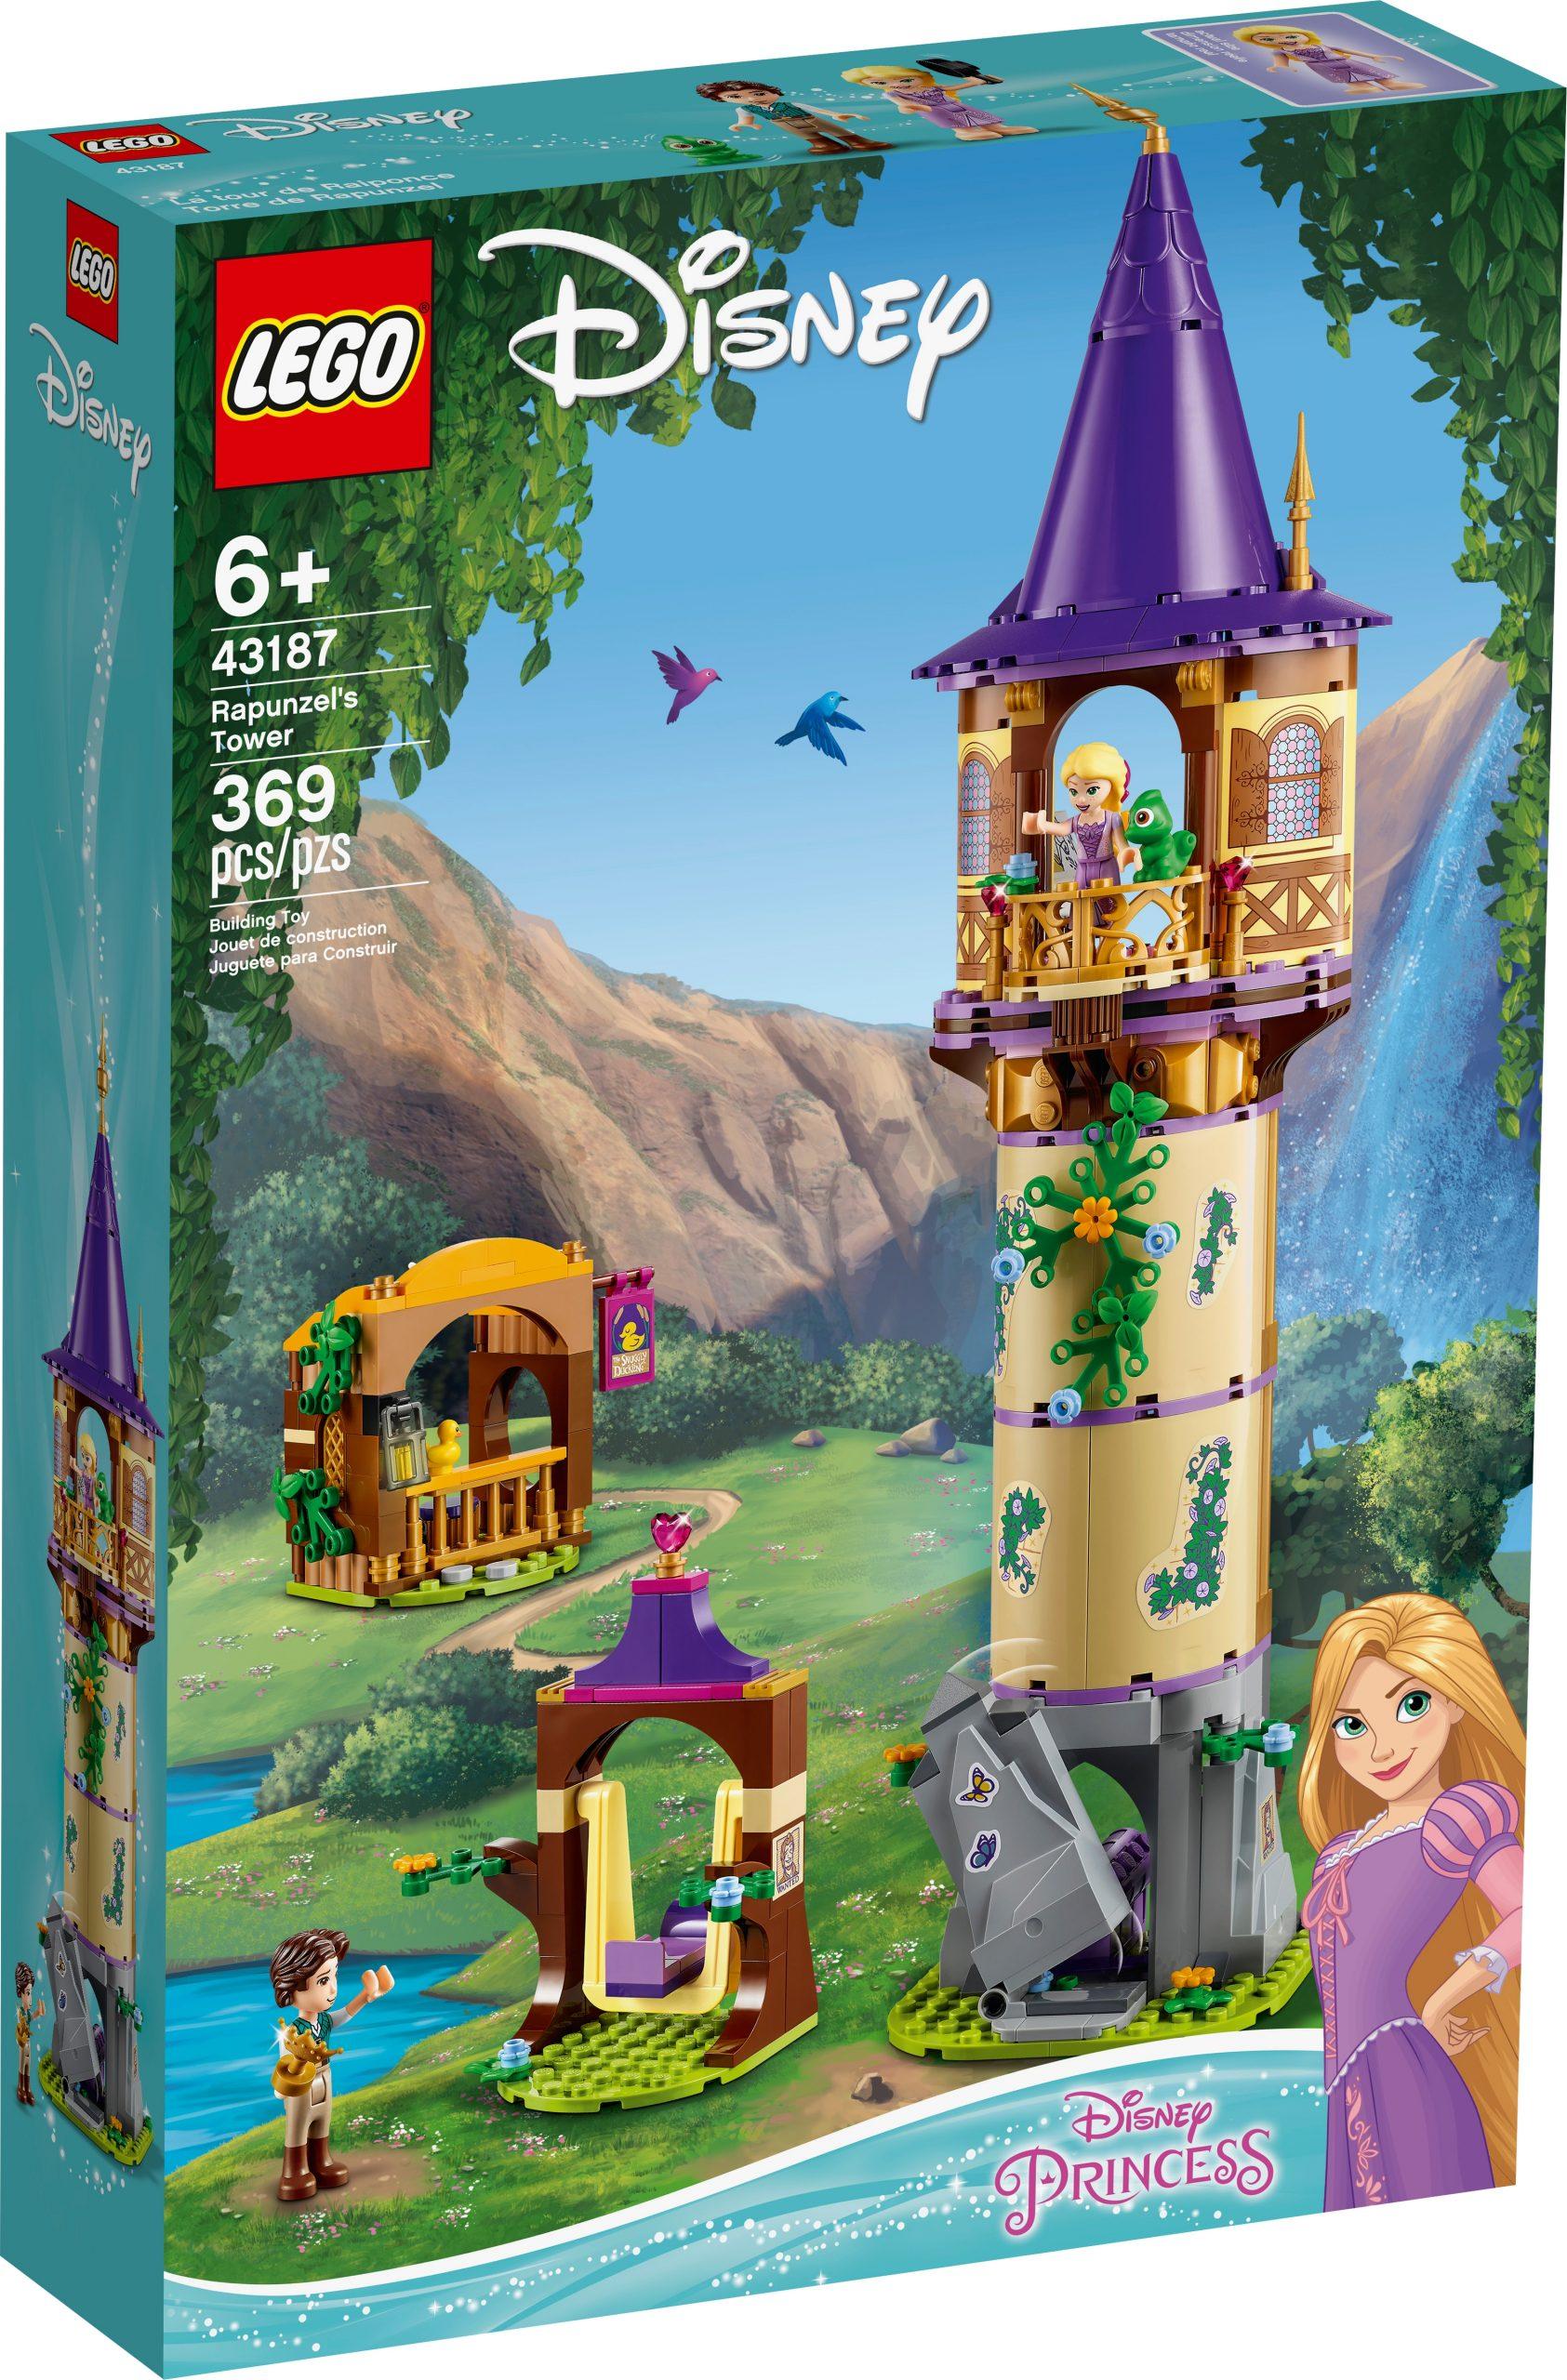 lego 43187 la torre di rapunzel scaled